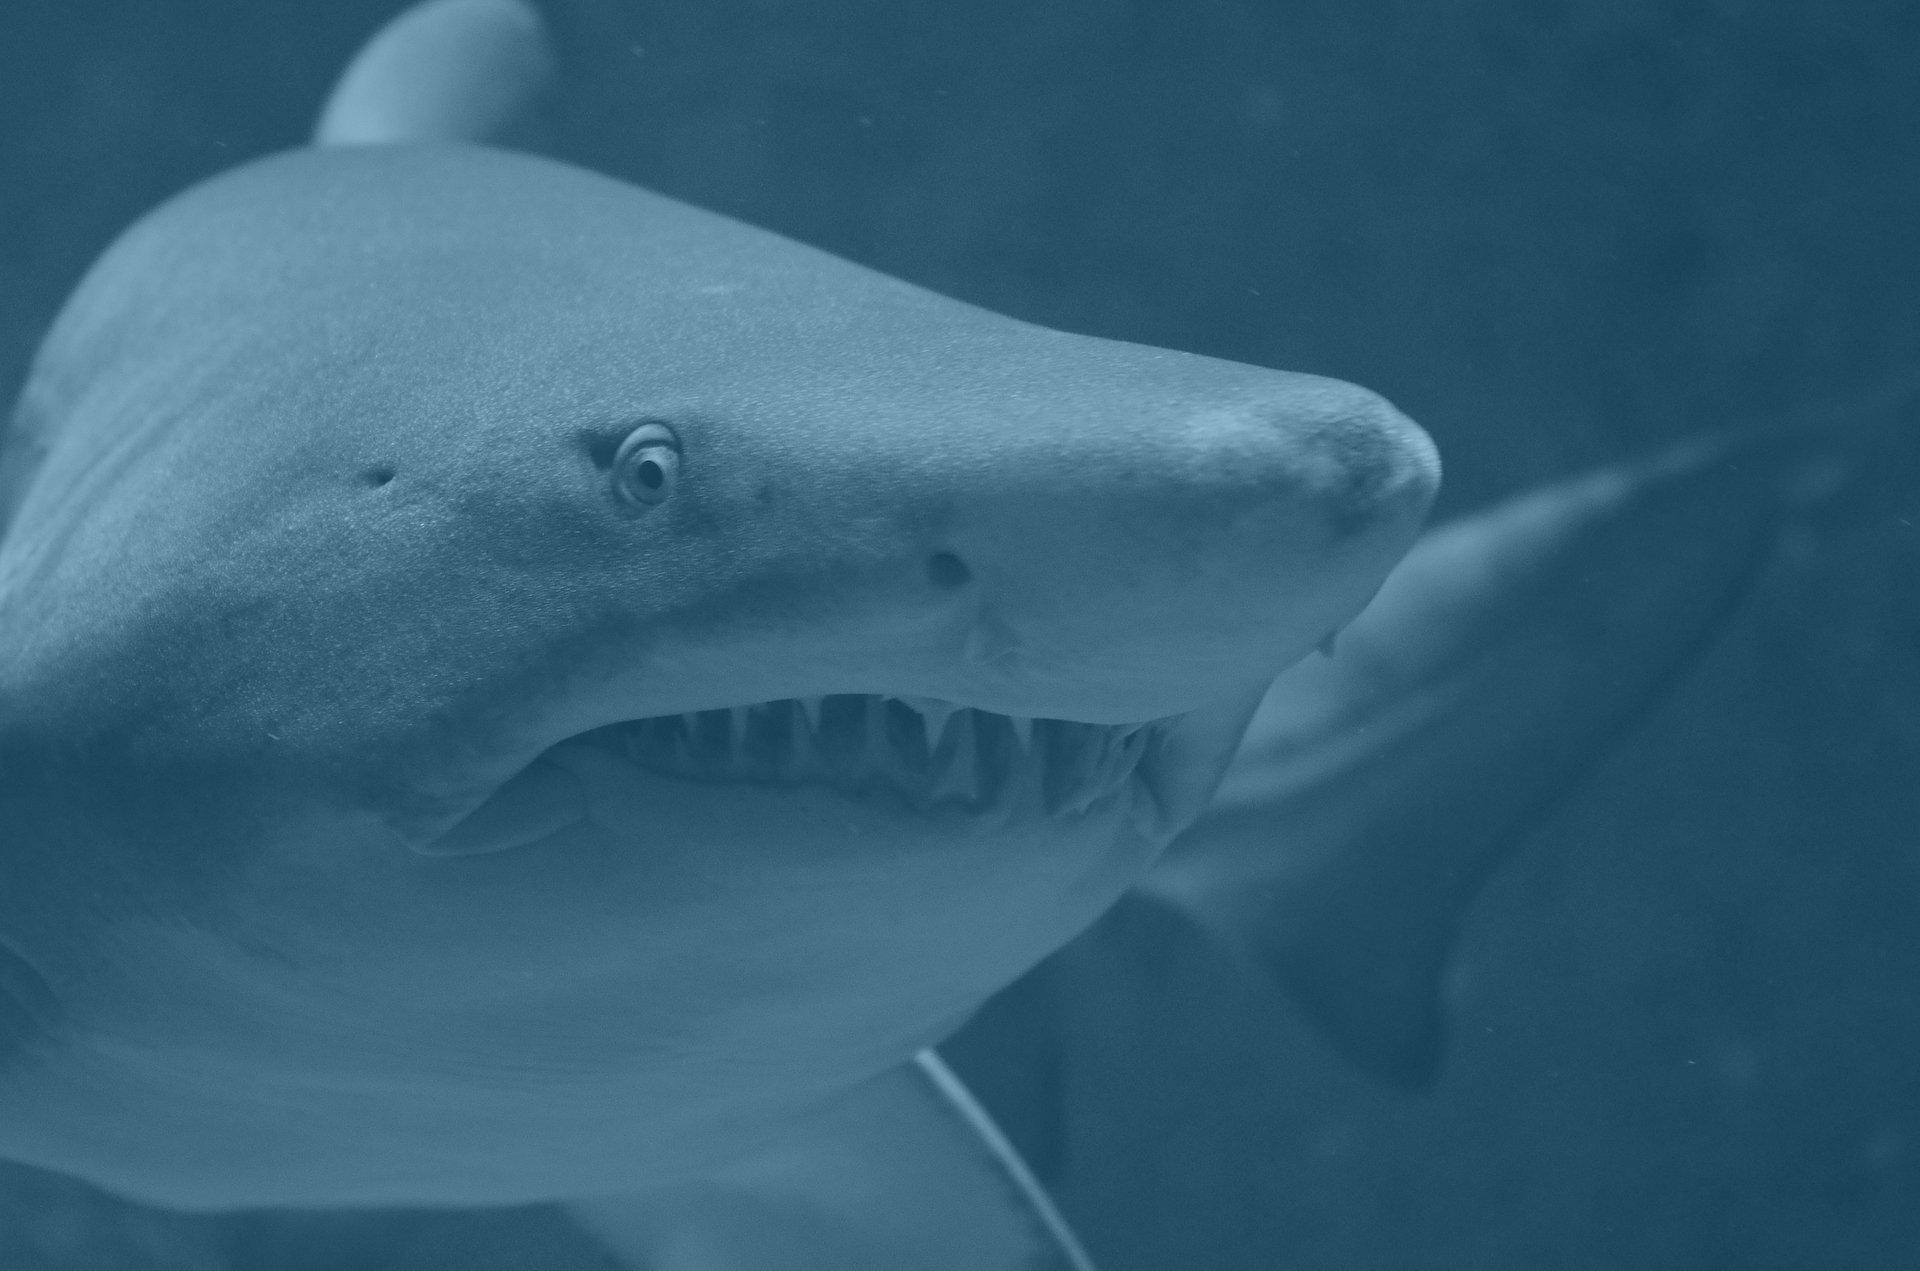 close up of smiling shark eyes and teeth